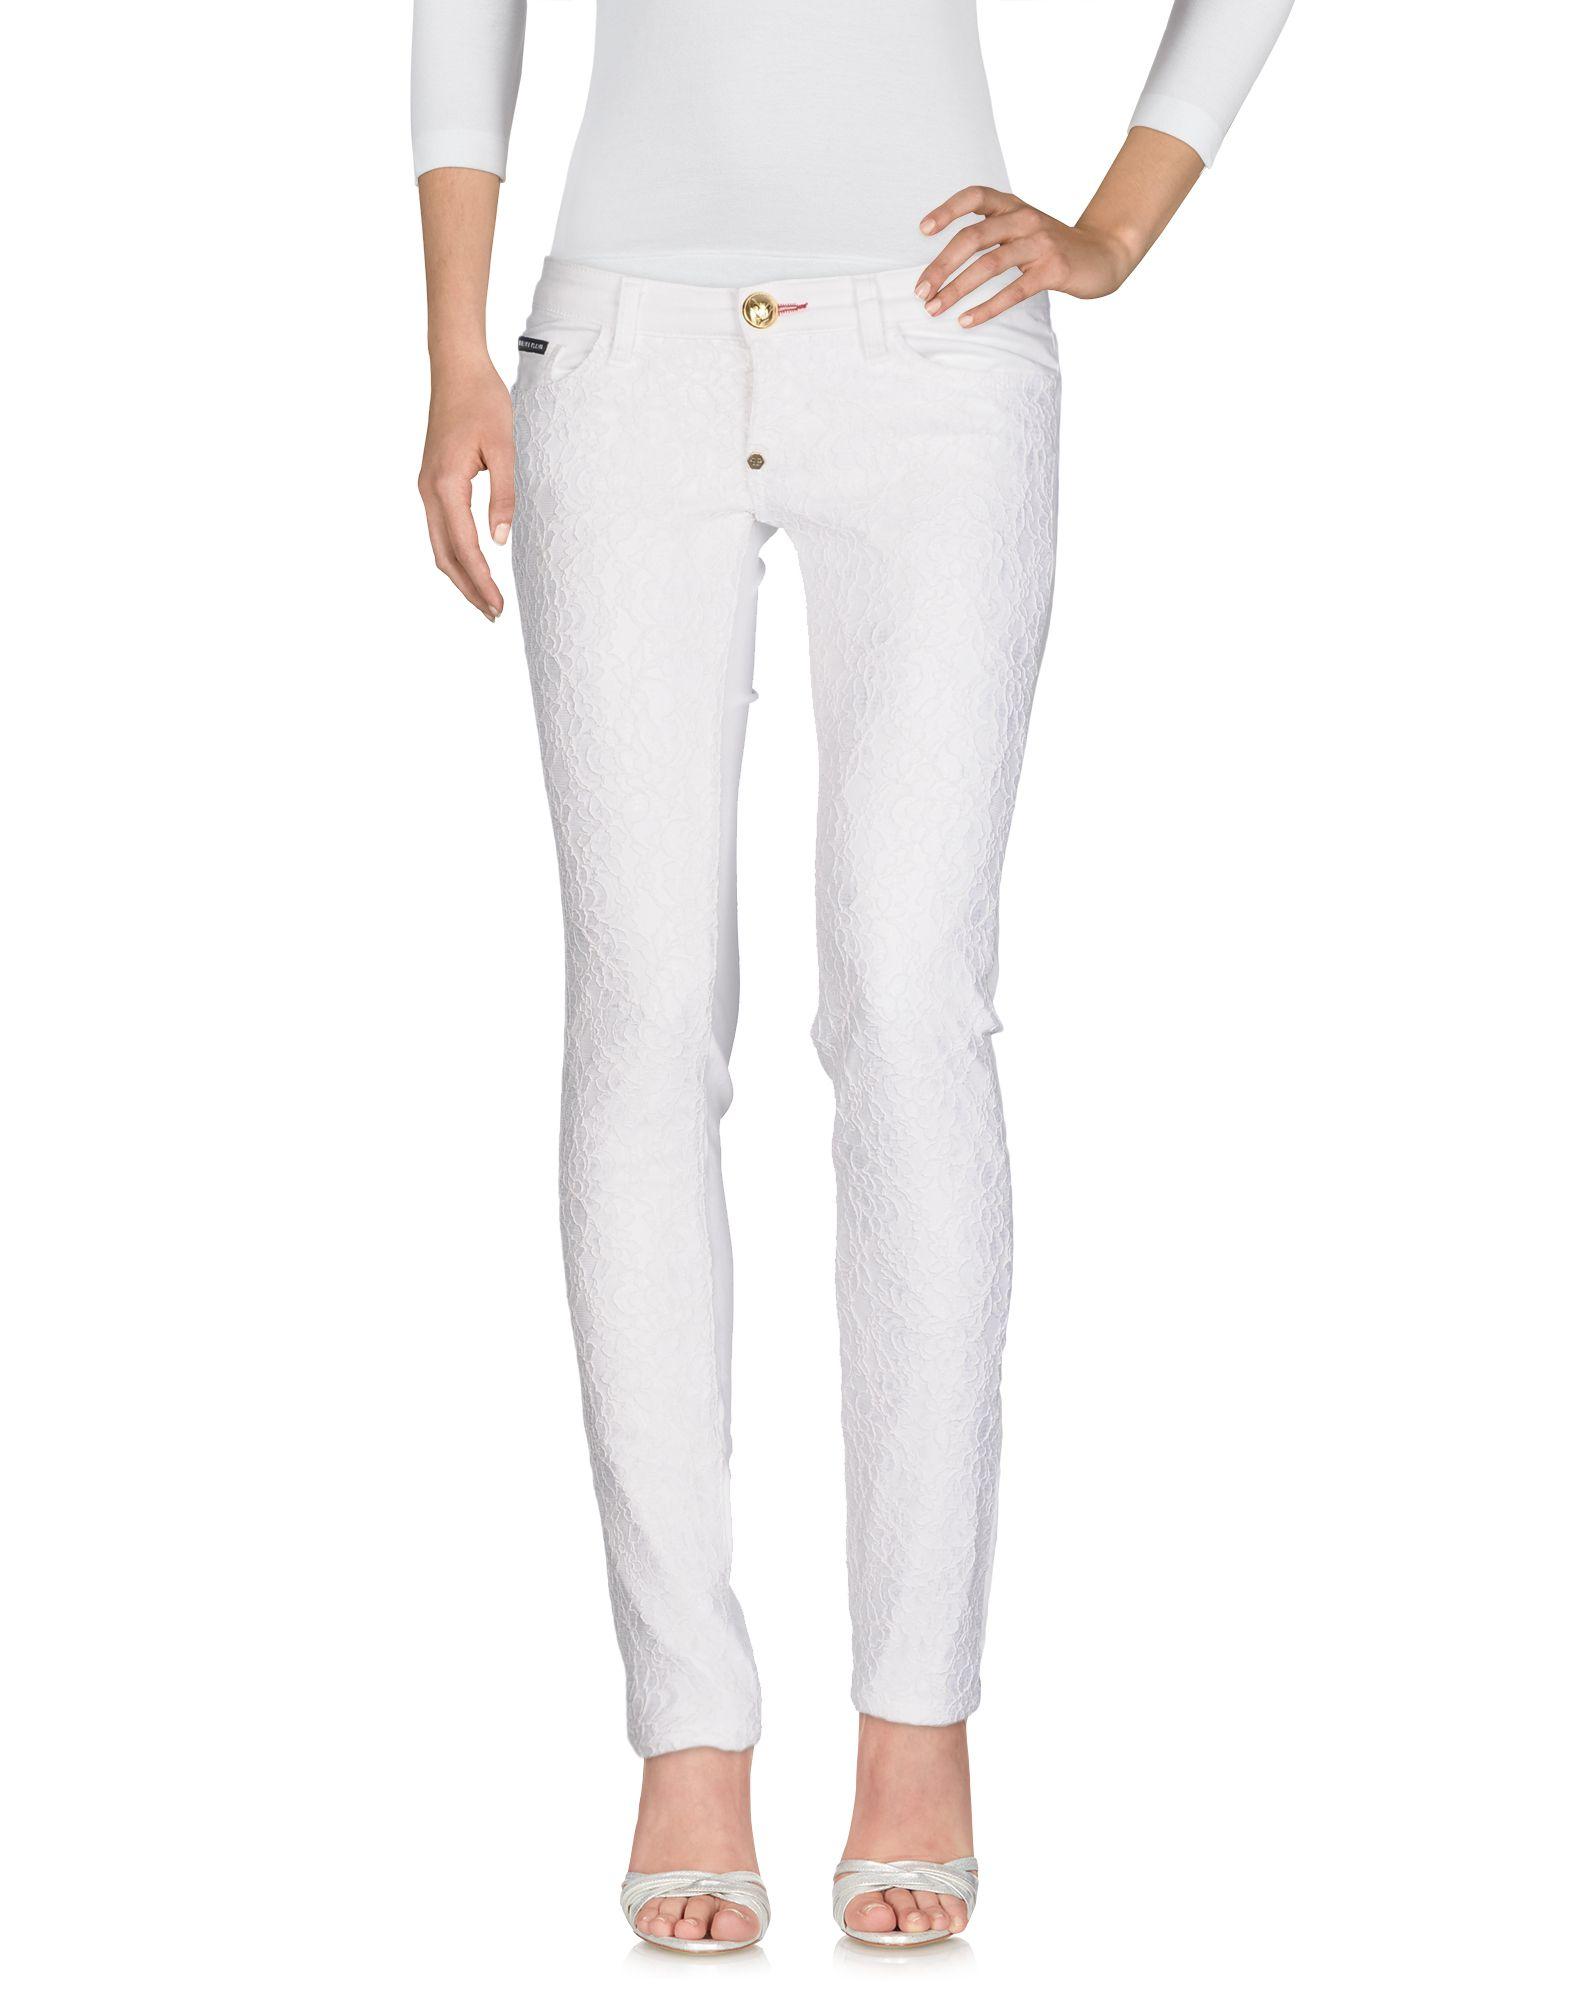 Pantaloni Jeans Philipp Plein Donna - Acquista online su u8HShoo